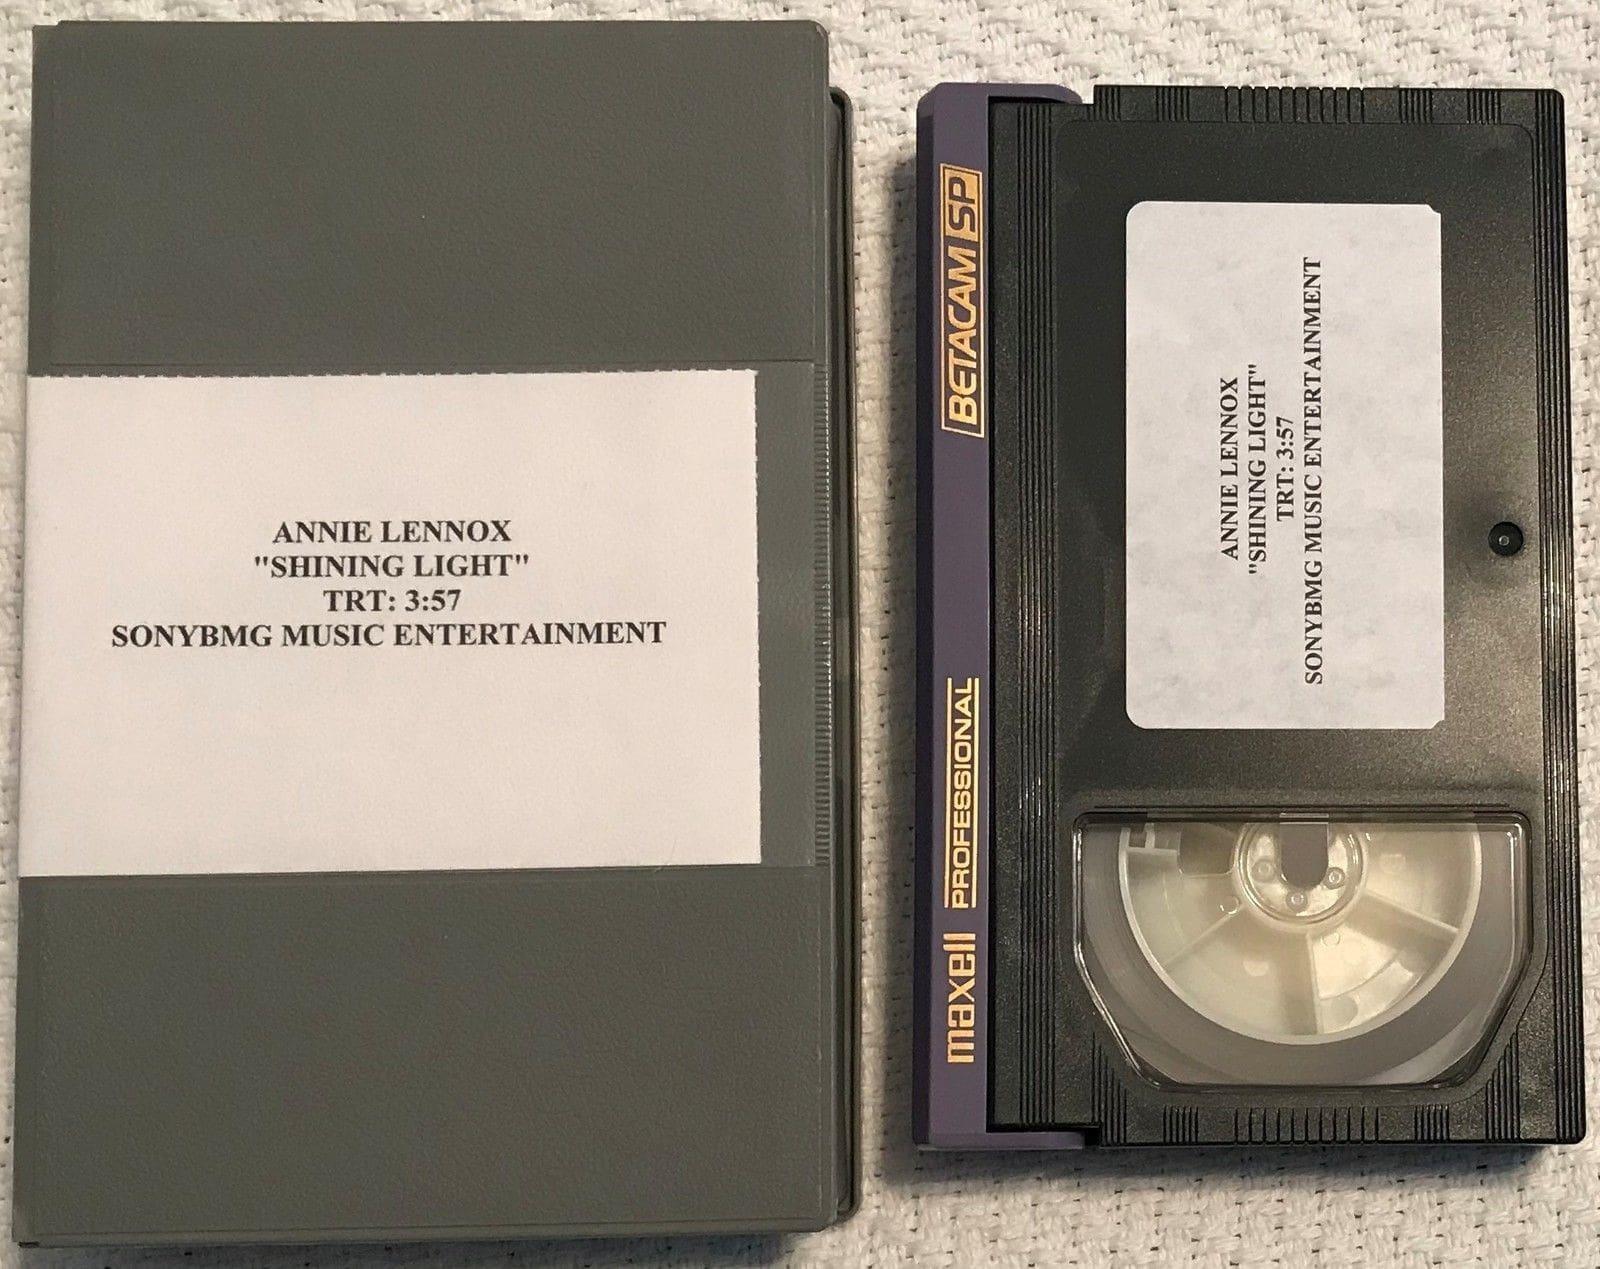 5089 - Annie Lennox - Videopromo - Shining Light - USA - Promo Video - None